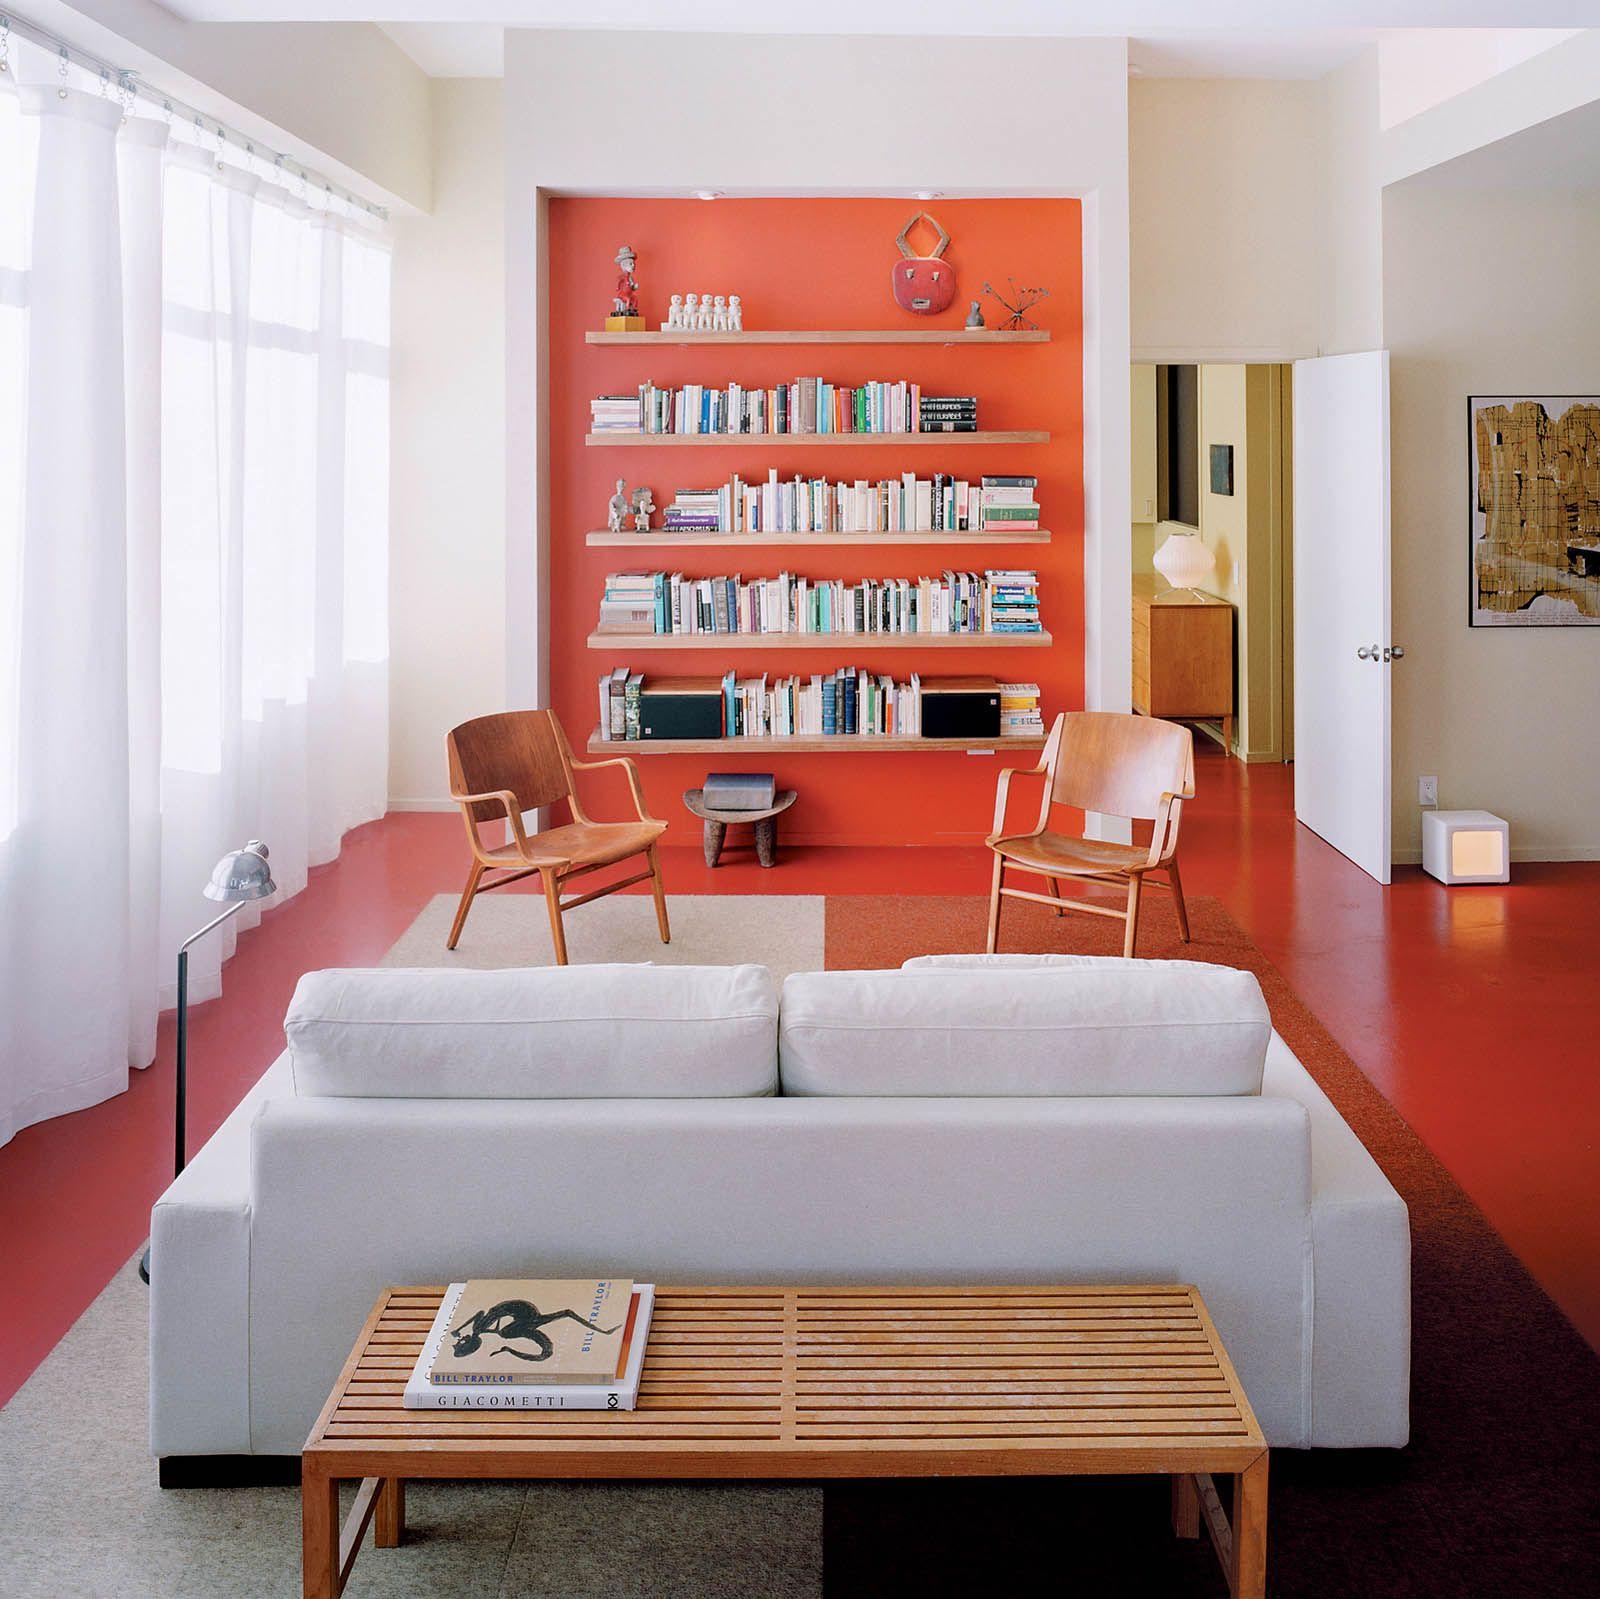 seamless color on floor and wall make